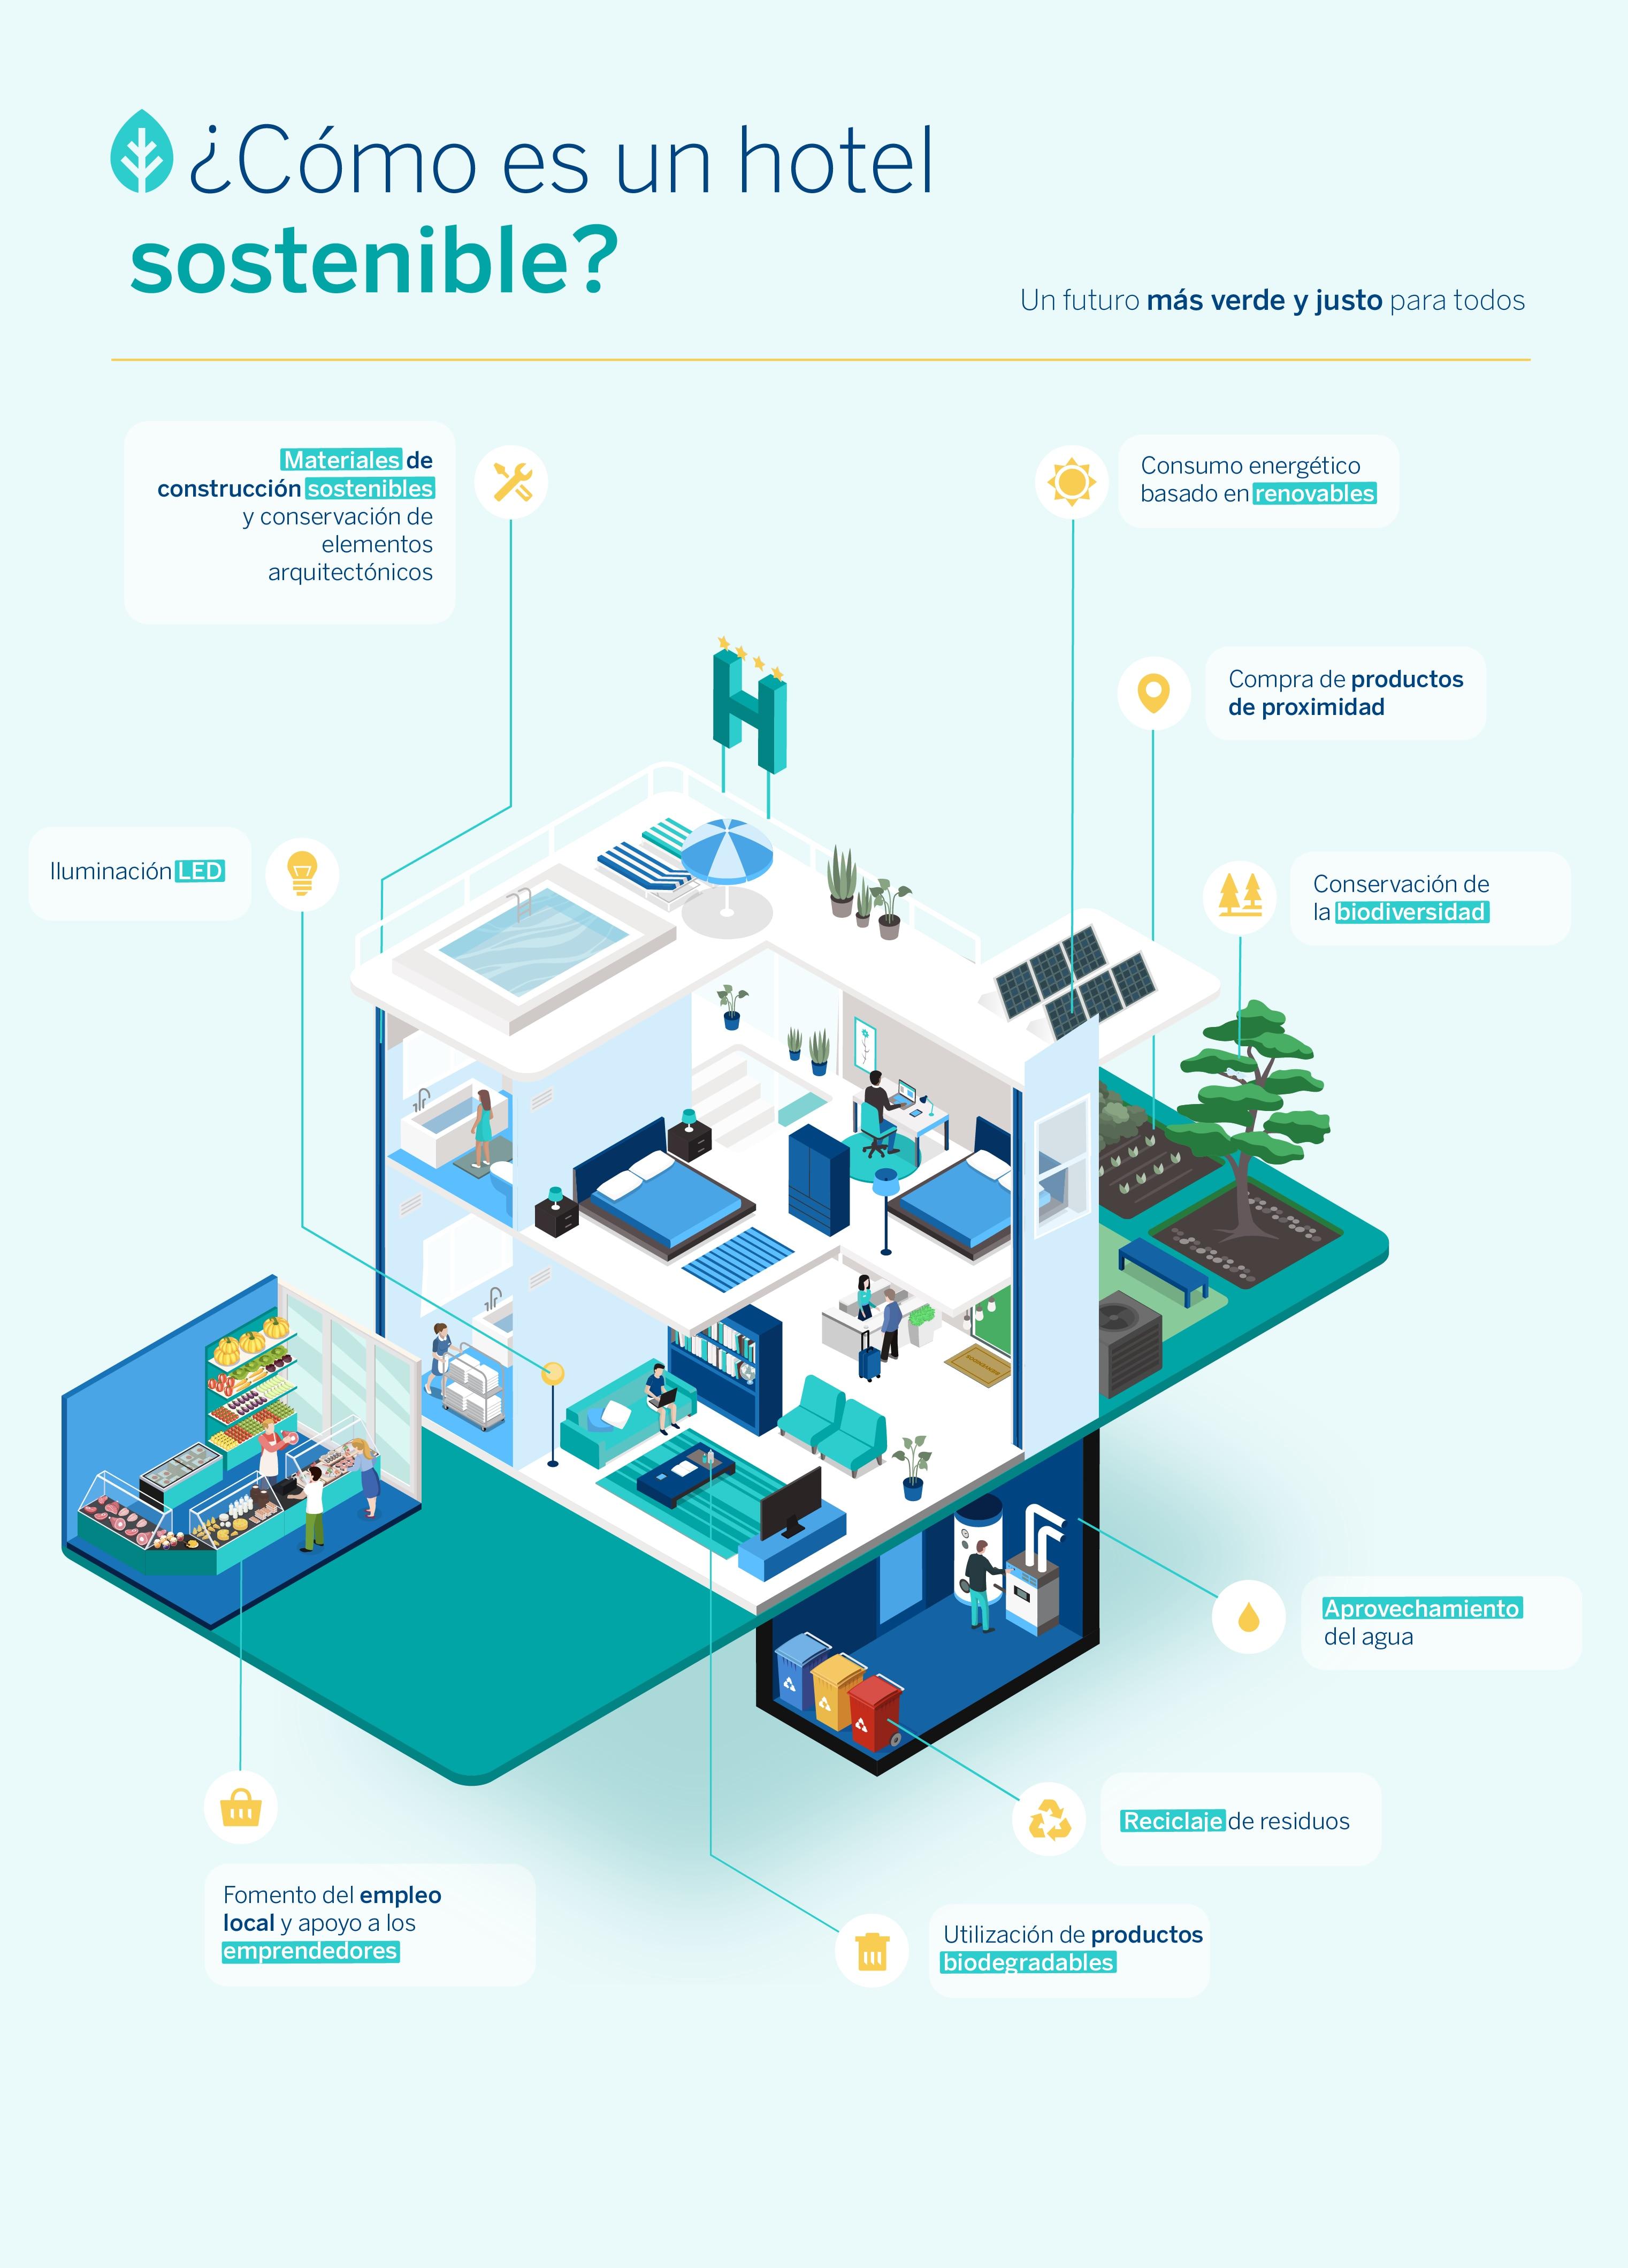 hotel-sostenible-bbva-sostenibilidad